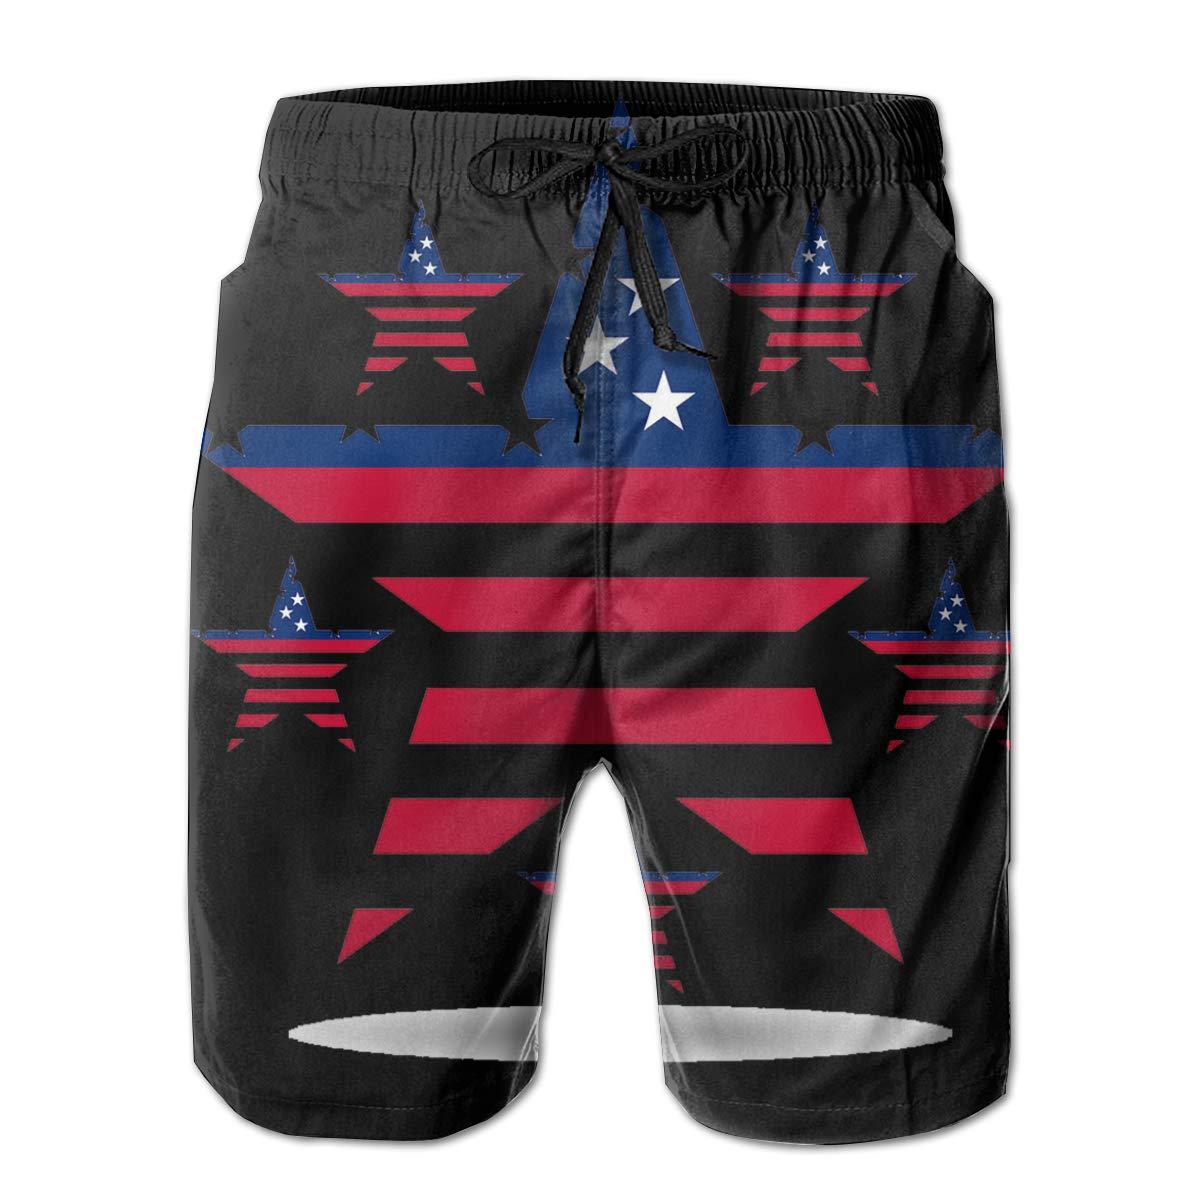 HZamora/_H Mens USA Flag in Stars Shape Summer Breathable Quick-Drying Swim Trunks Beach Shorts Cargo Shorts